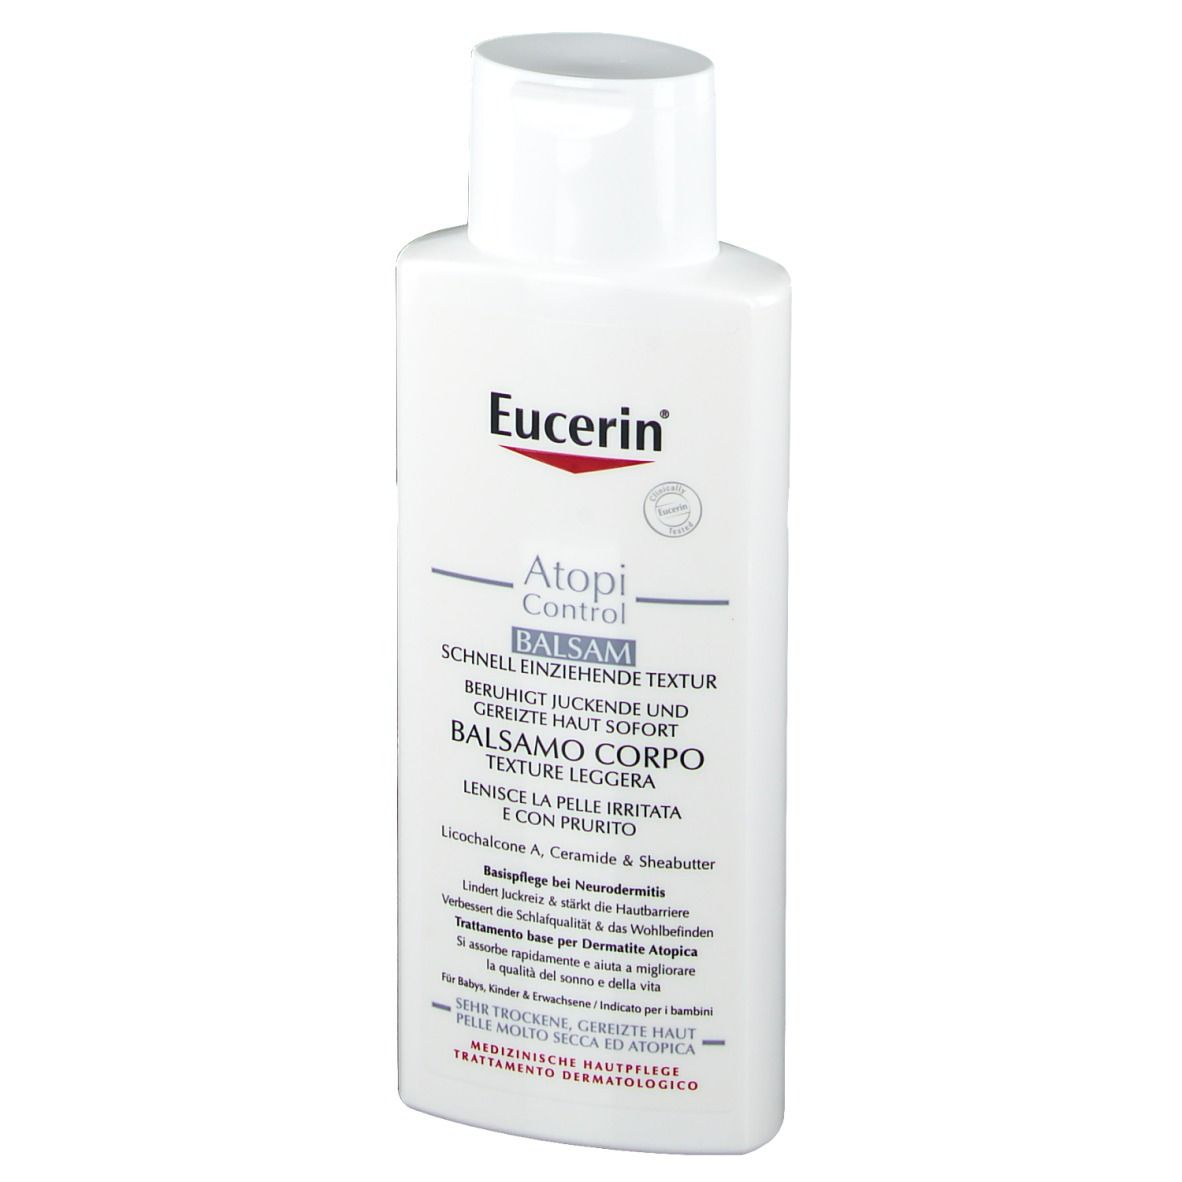 Eucerin® AtopiControl Balsam